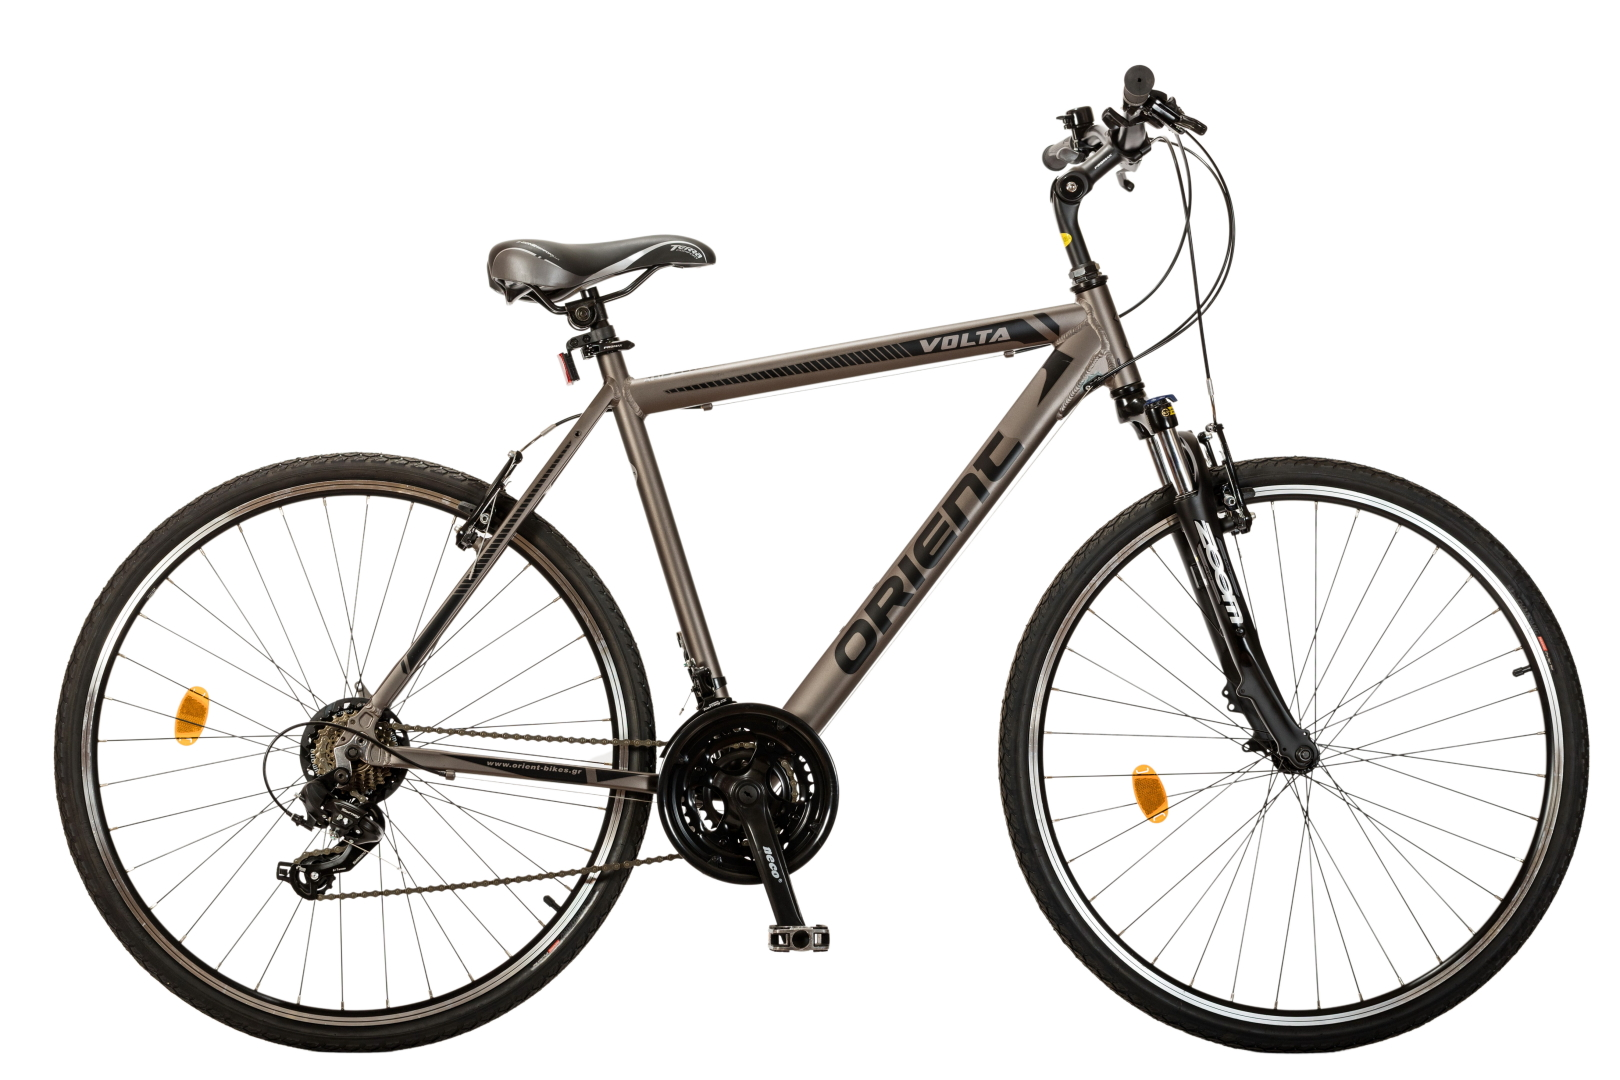 VOLTA man 21sp. bike image